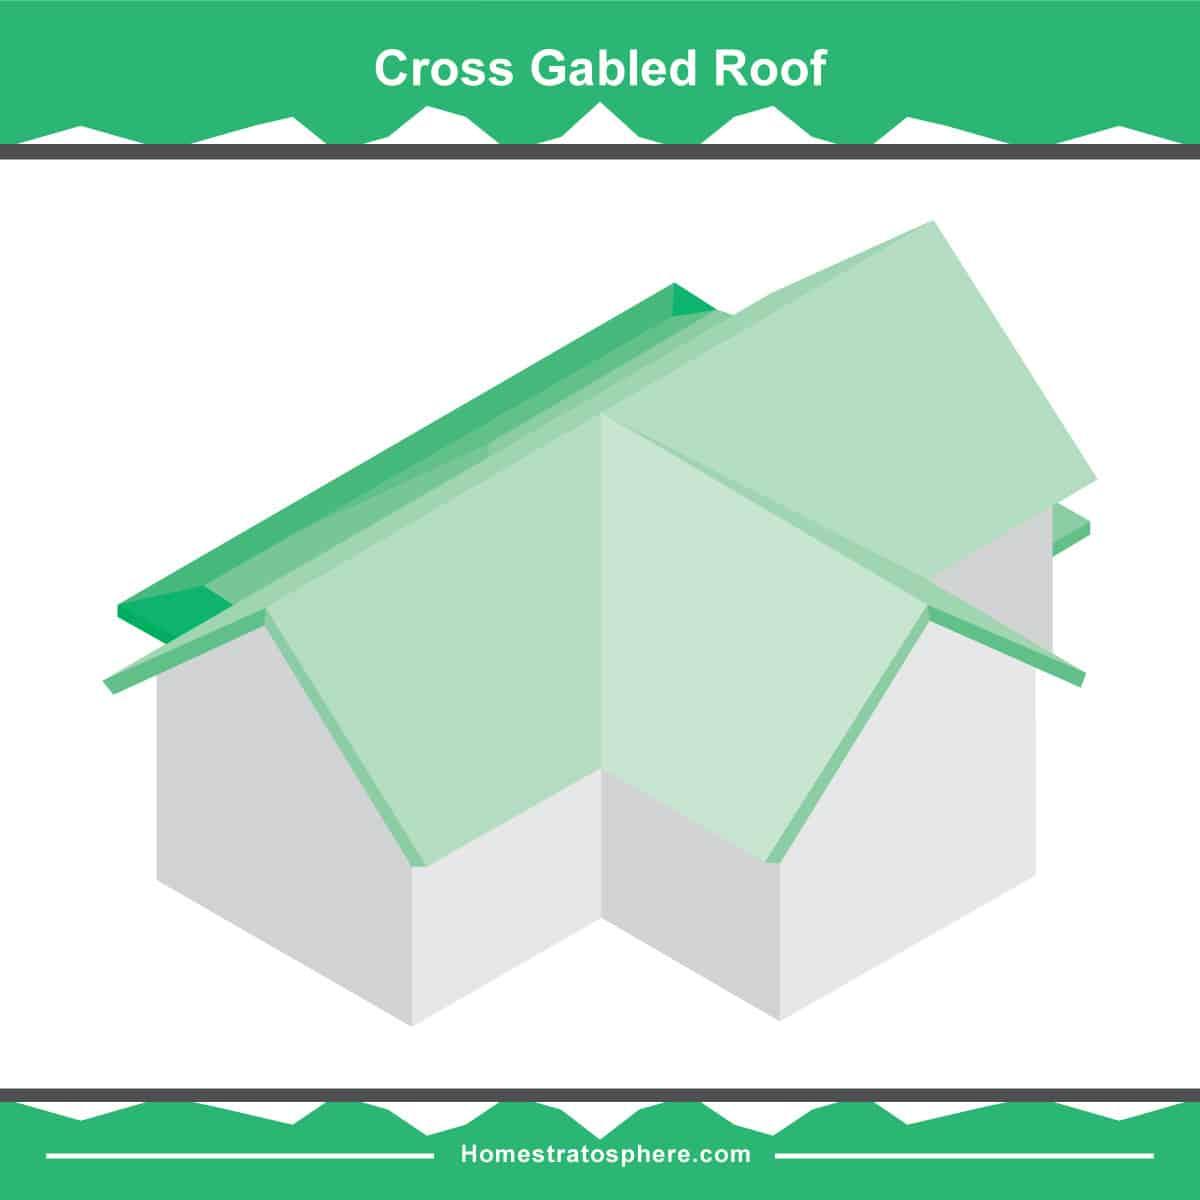 Cross gabled roof diagram